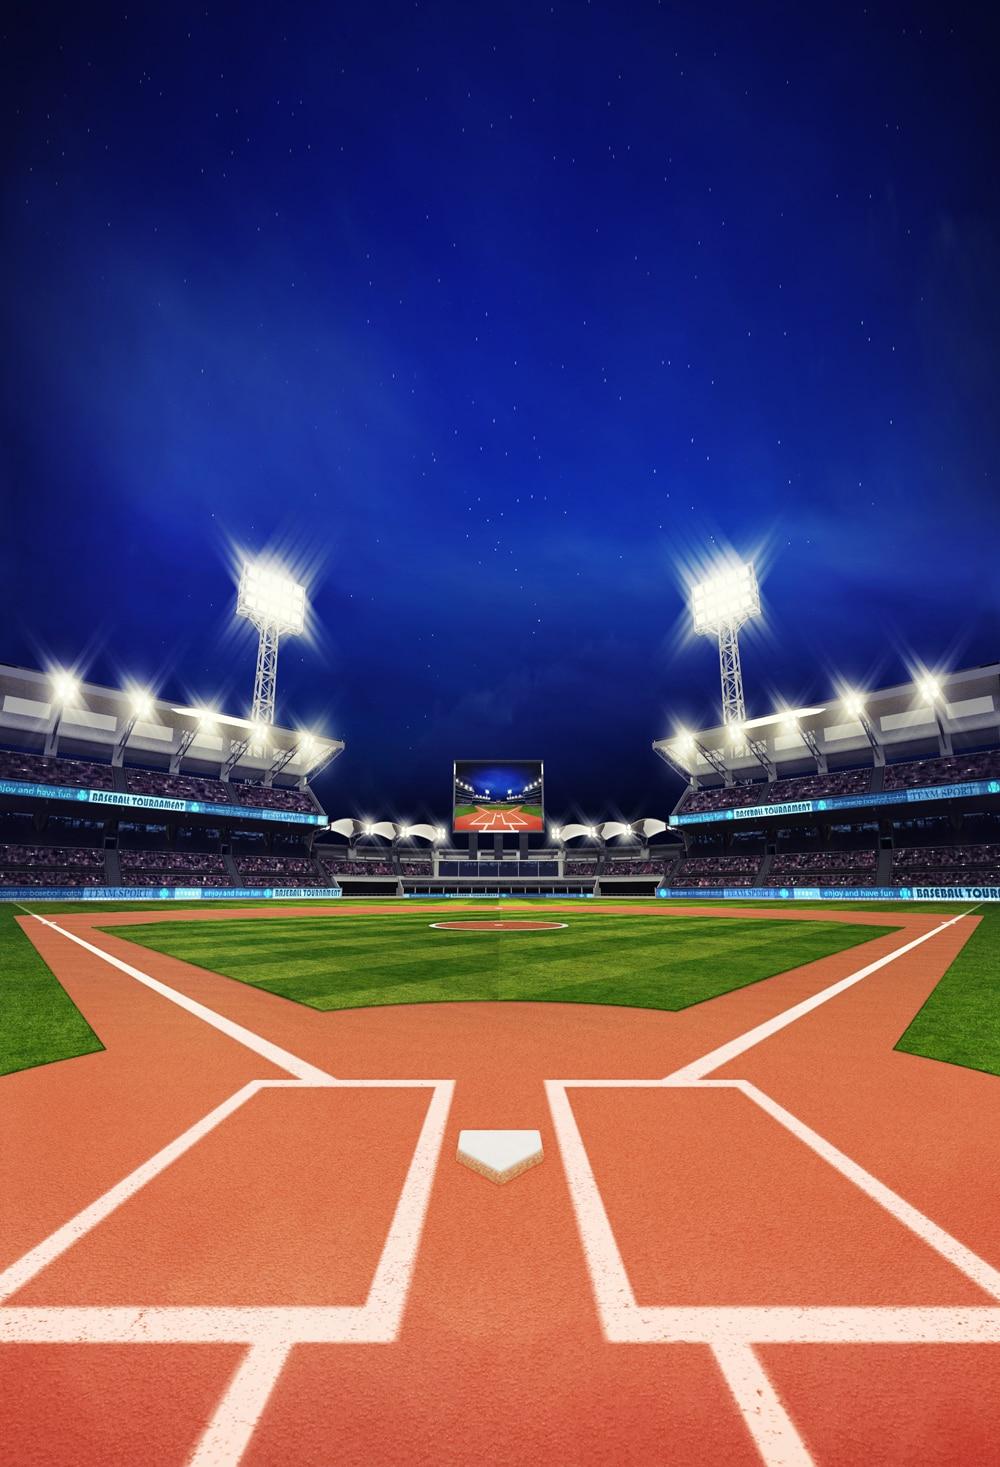 HUAYI Baseball field backdrop birthday photographer